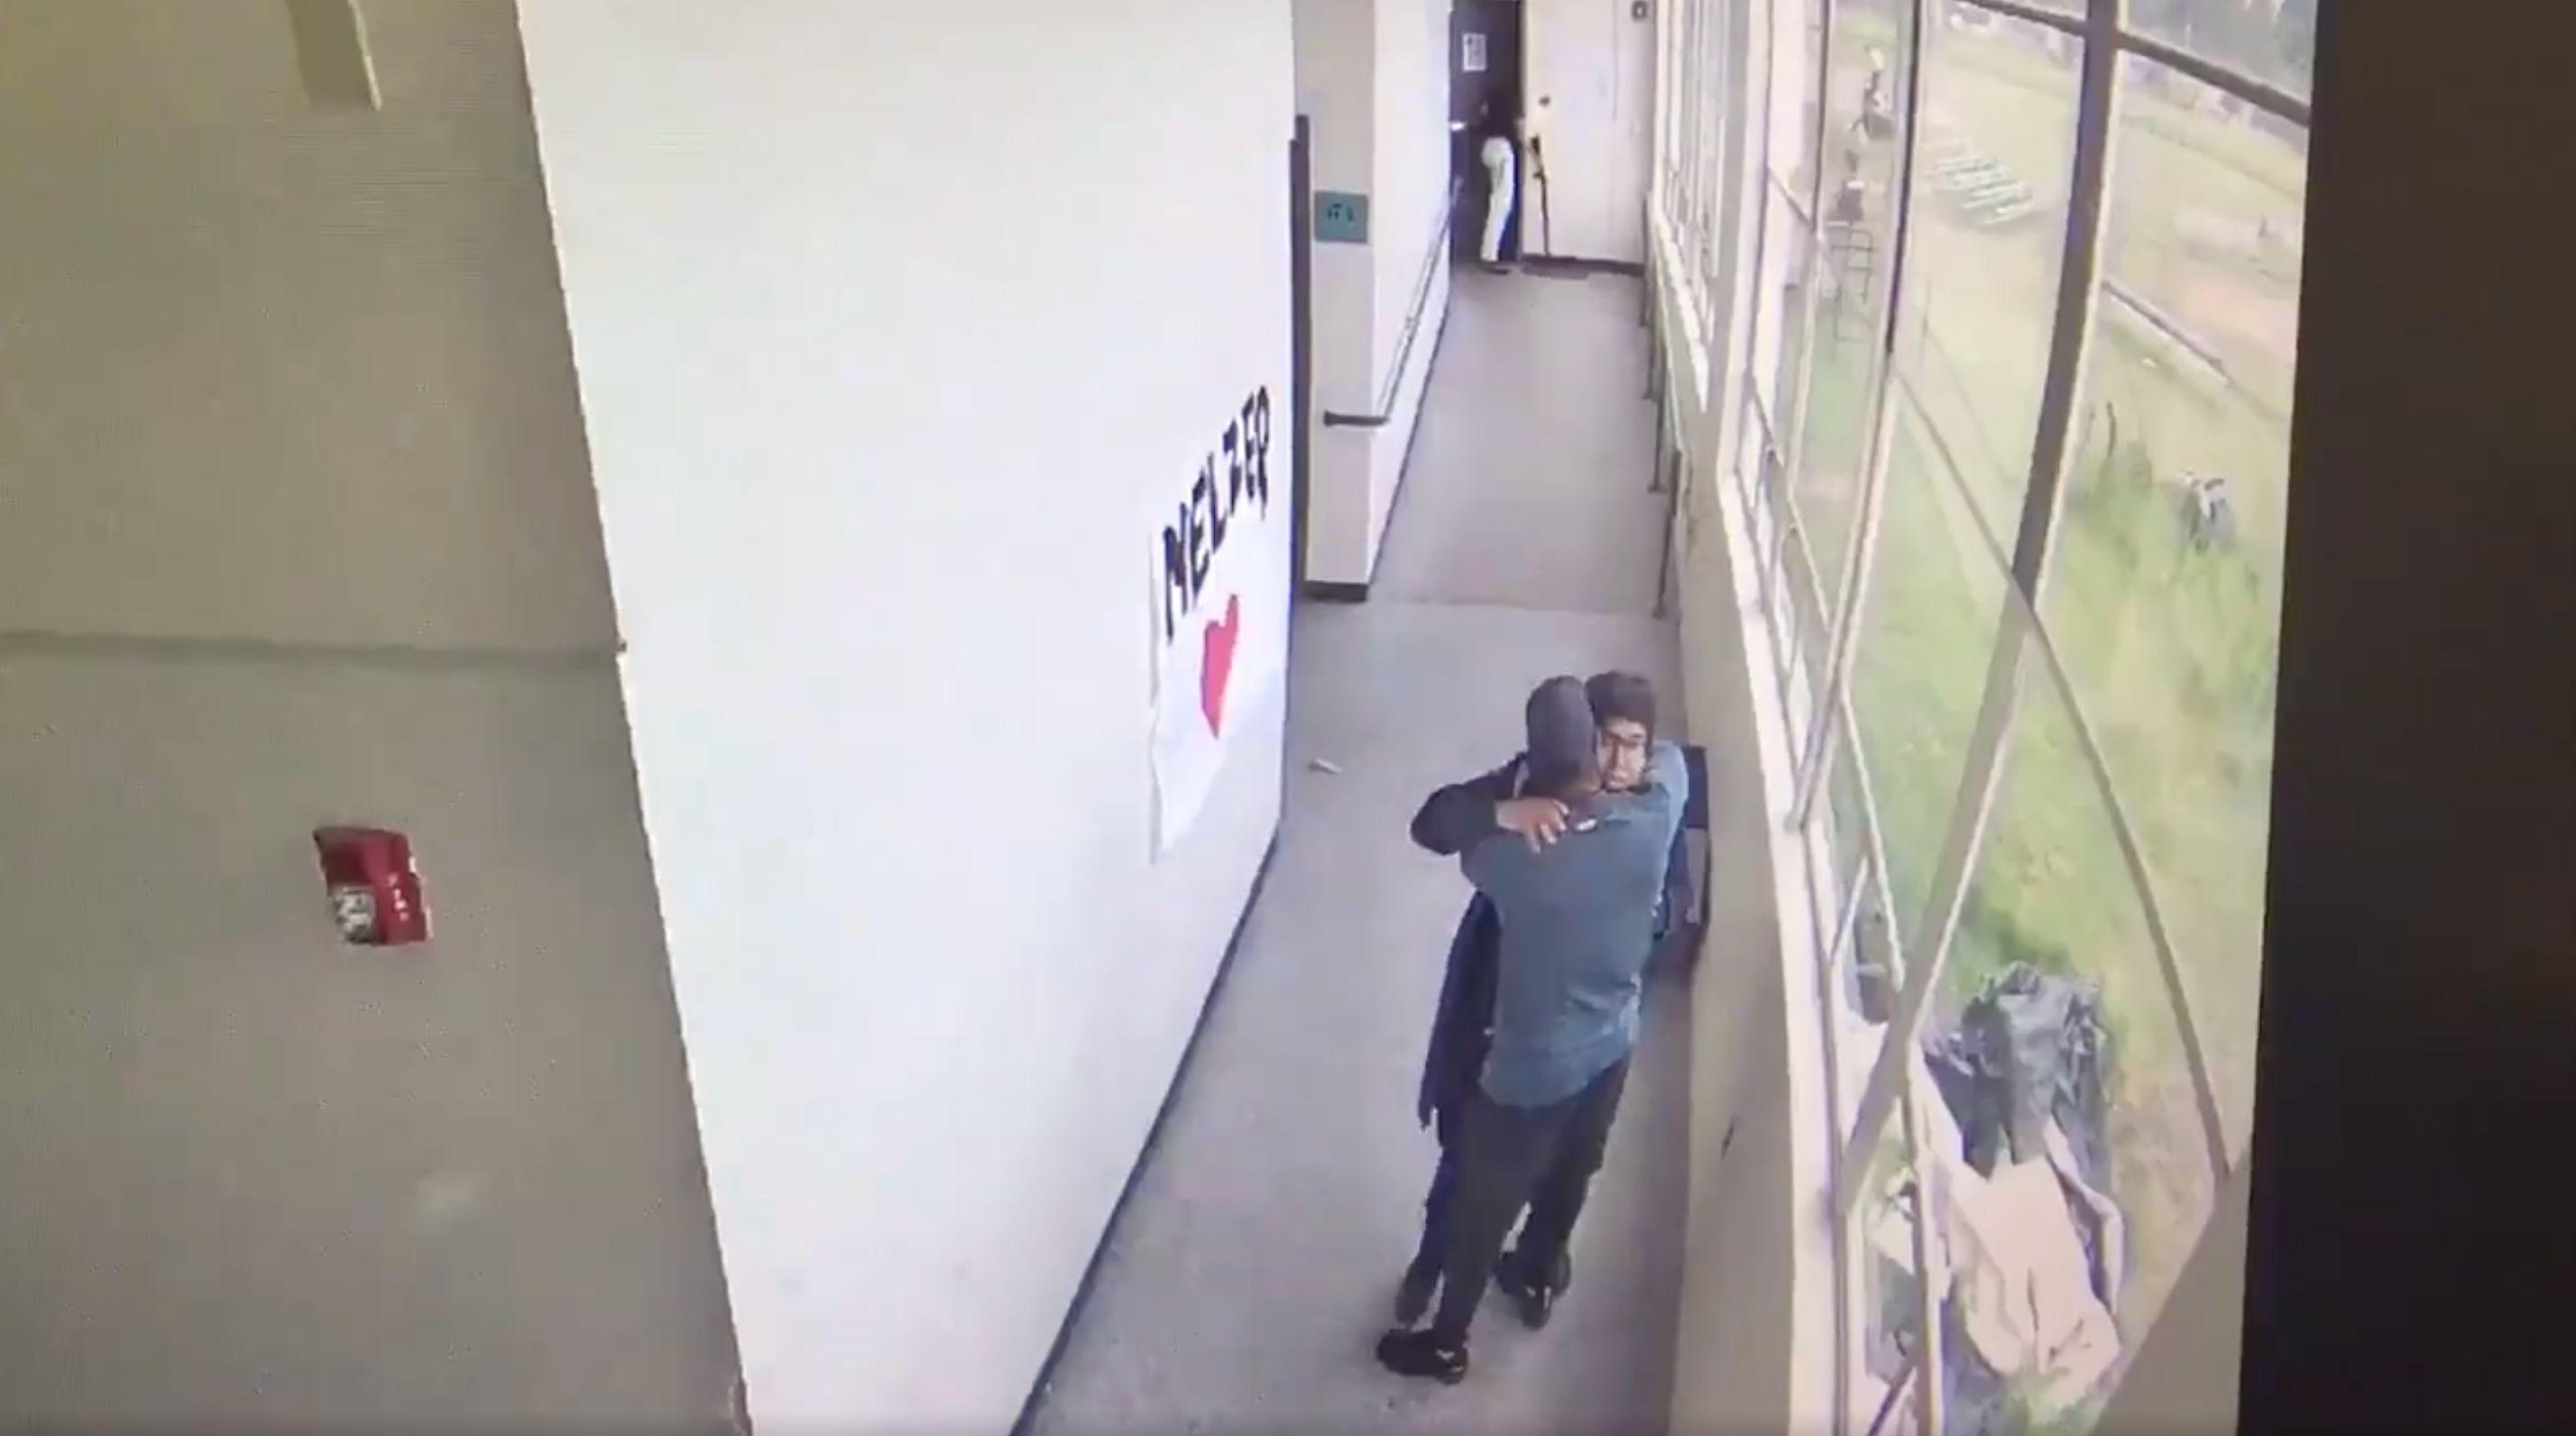 Powerful Video Shows School Coach Comforting Would-Be Gunman